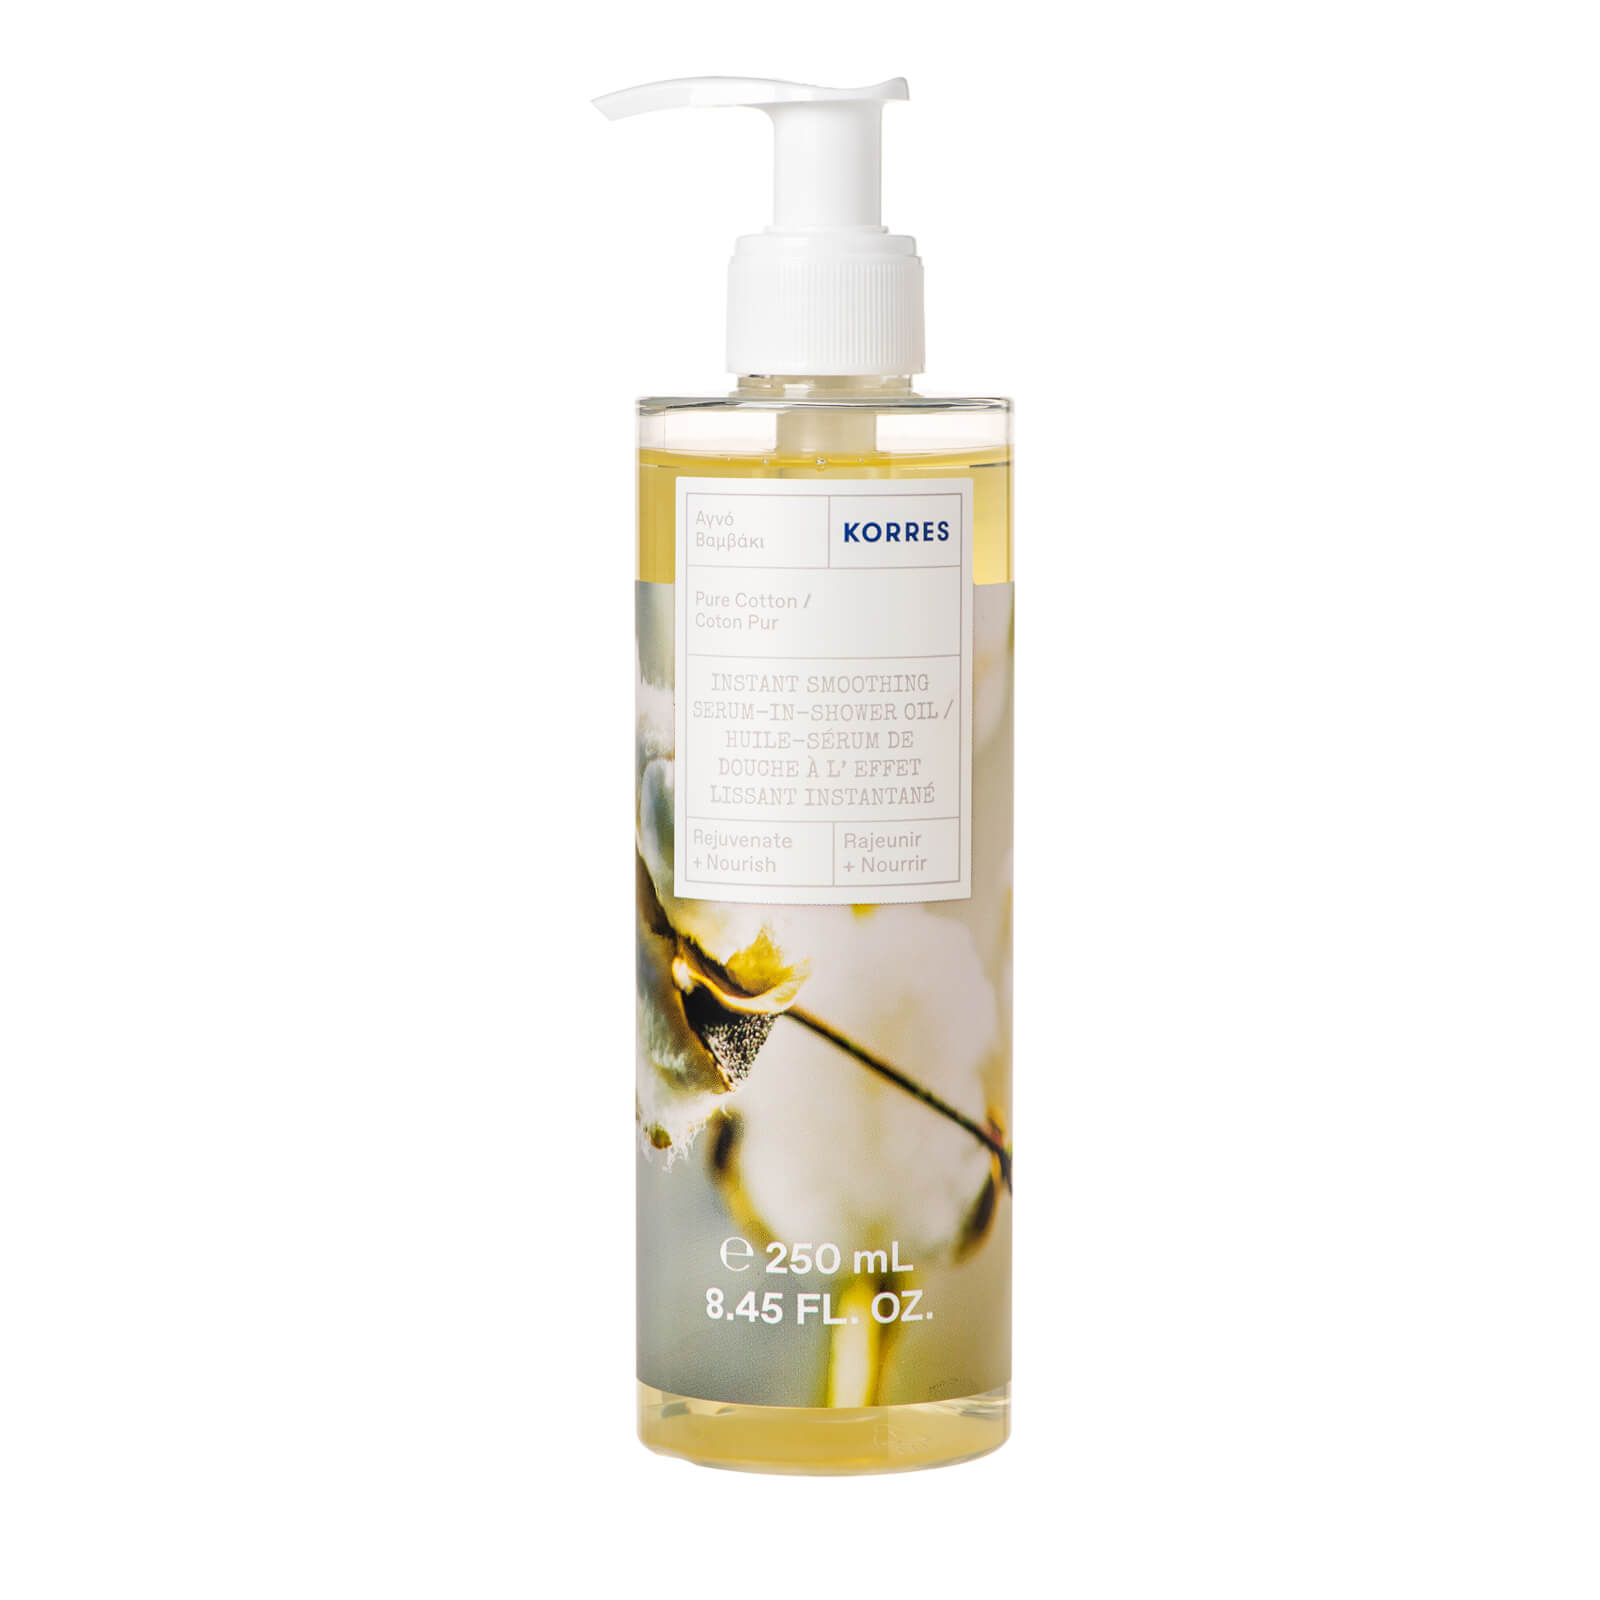 Купить Korres Sea Lavender Instant Smoothing Serum-In-Shower Oil 250ml